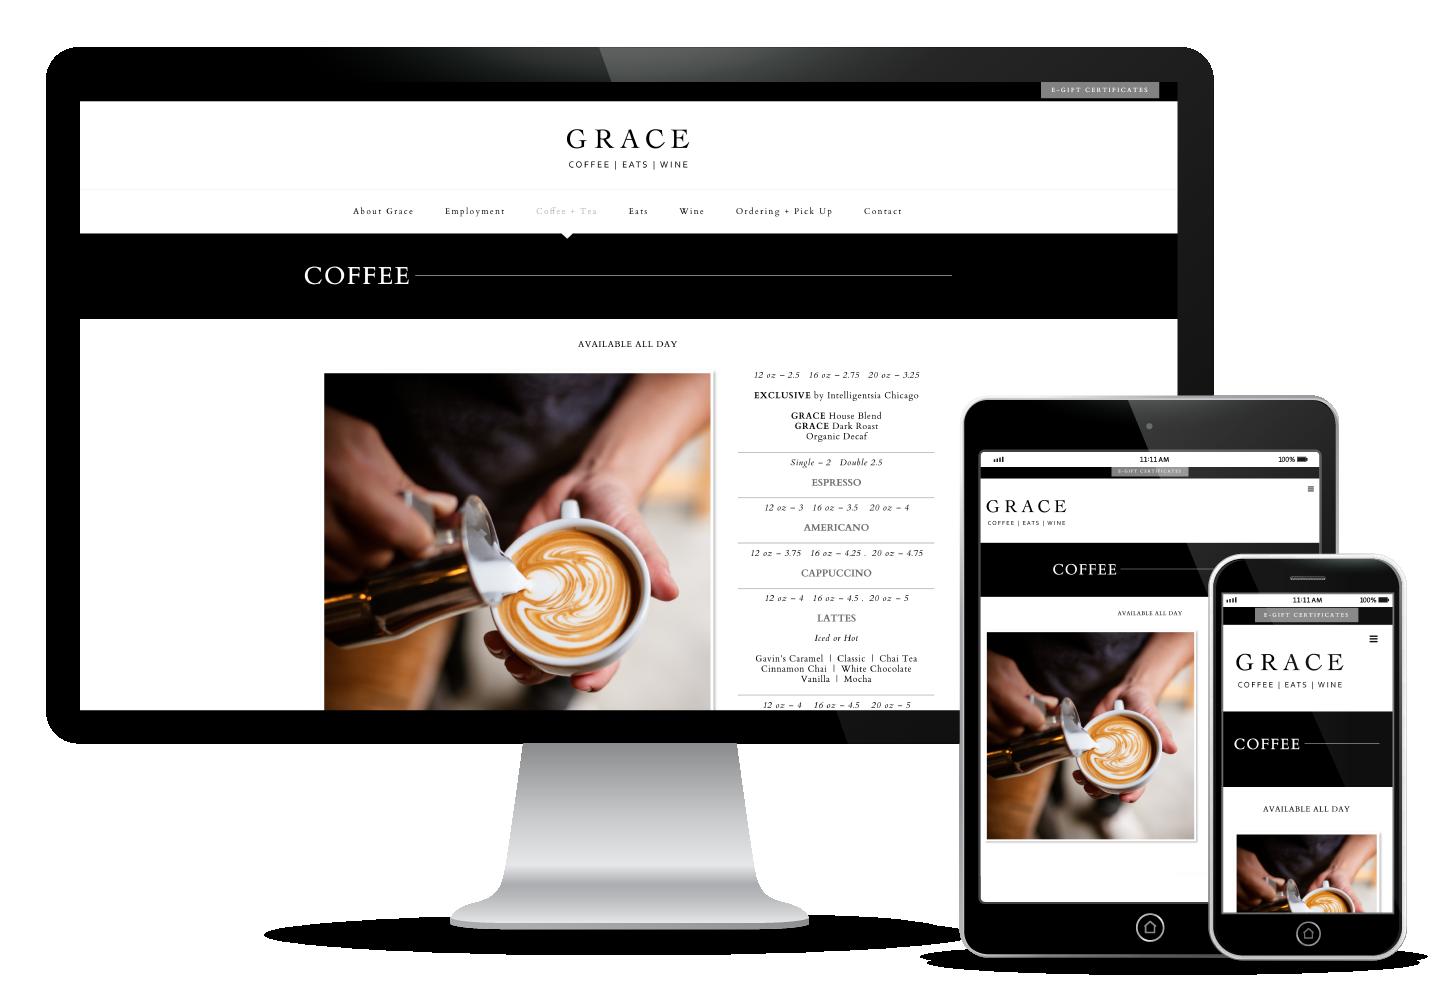 GRACE Coffee and Wine Website Design